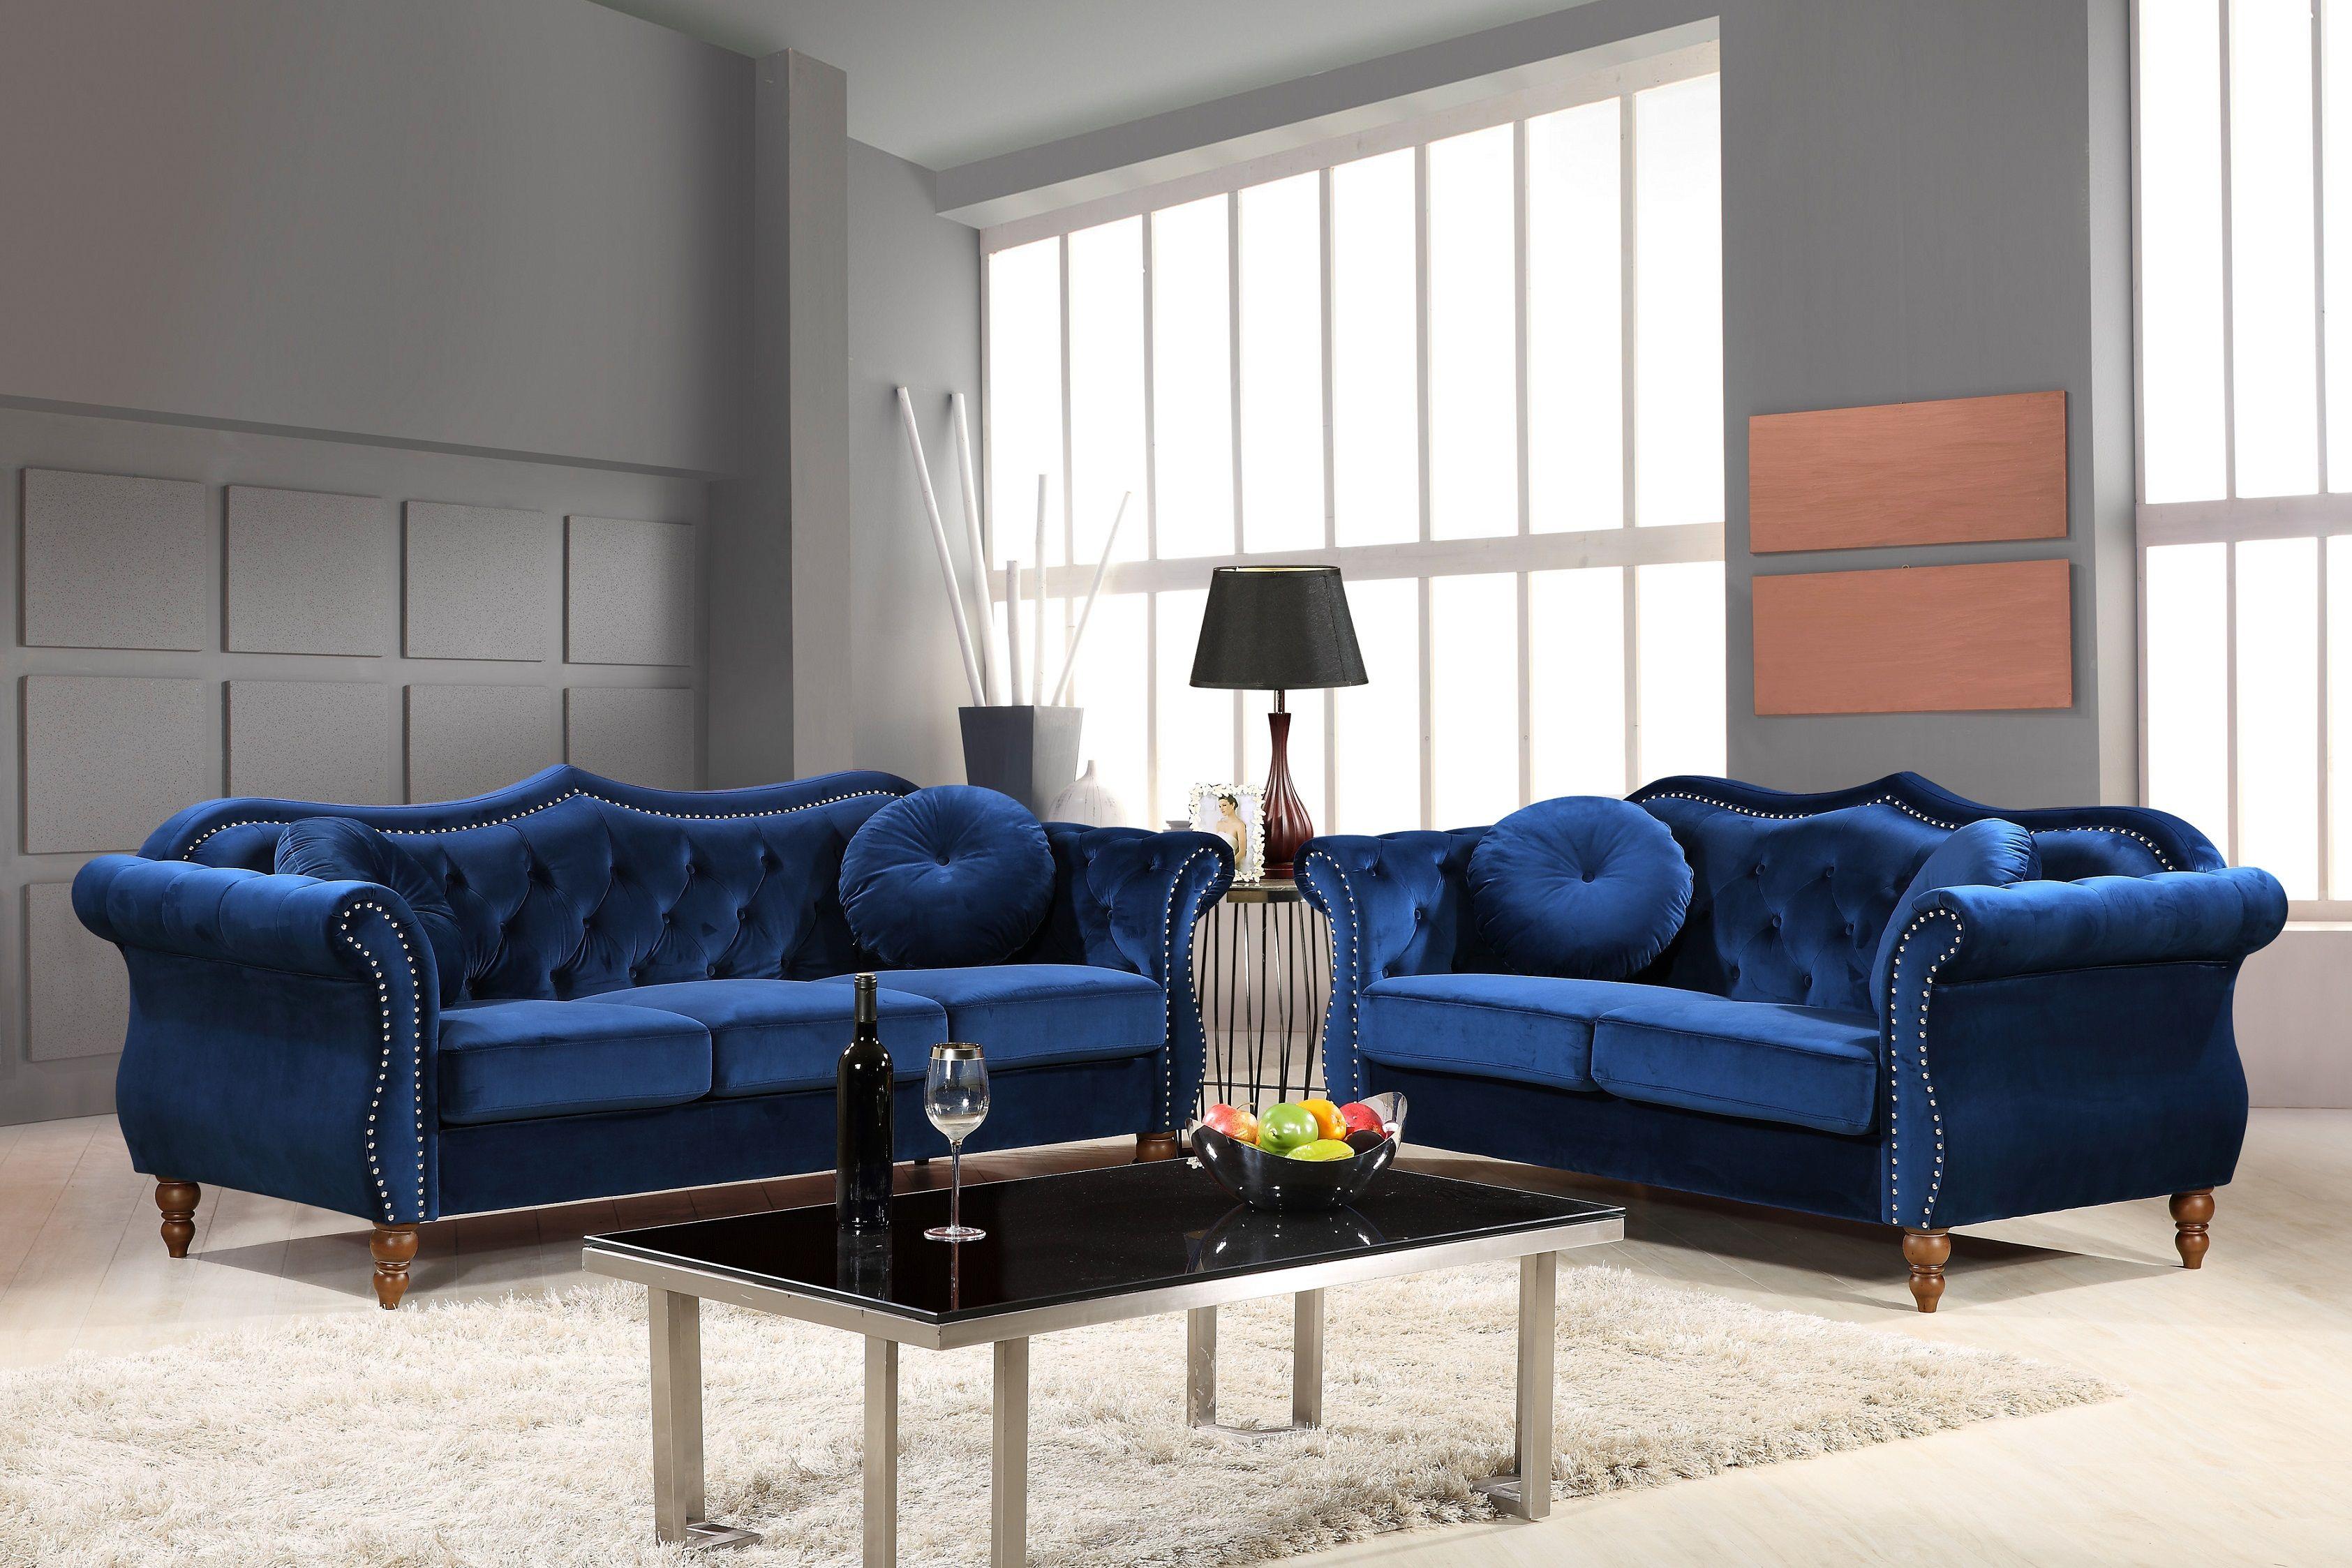 Us Pride Furniture Carbon Classic Nail Head Chesterfield 2 Piece Living Room Set Blue Walmart Com In 2021 Living Room Sofa Set Blue Living Room Sets Blue Sofa Living